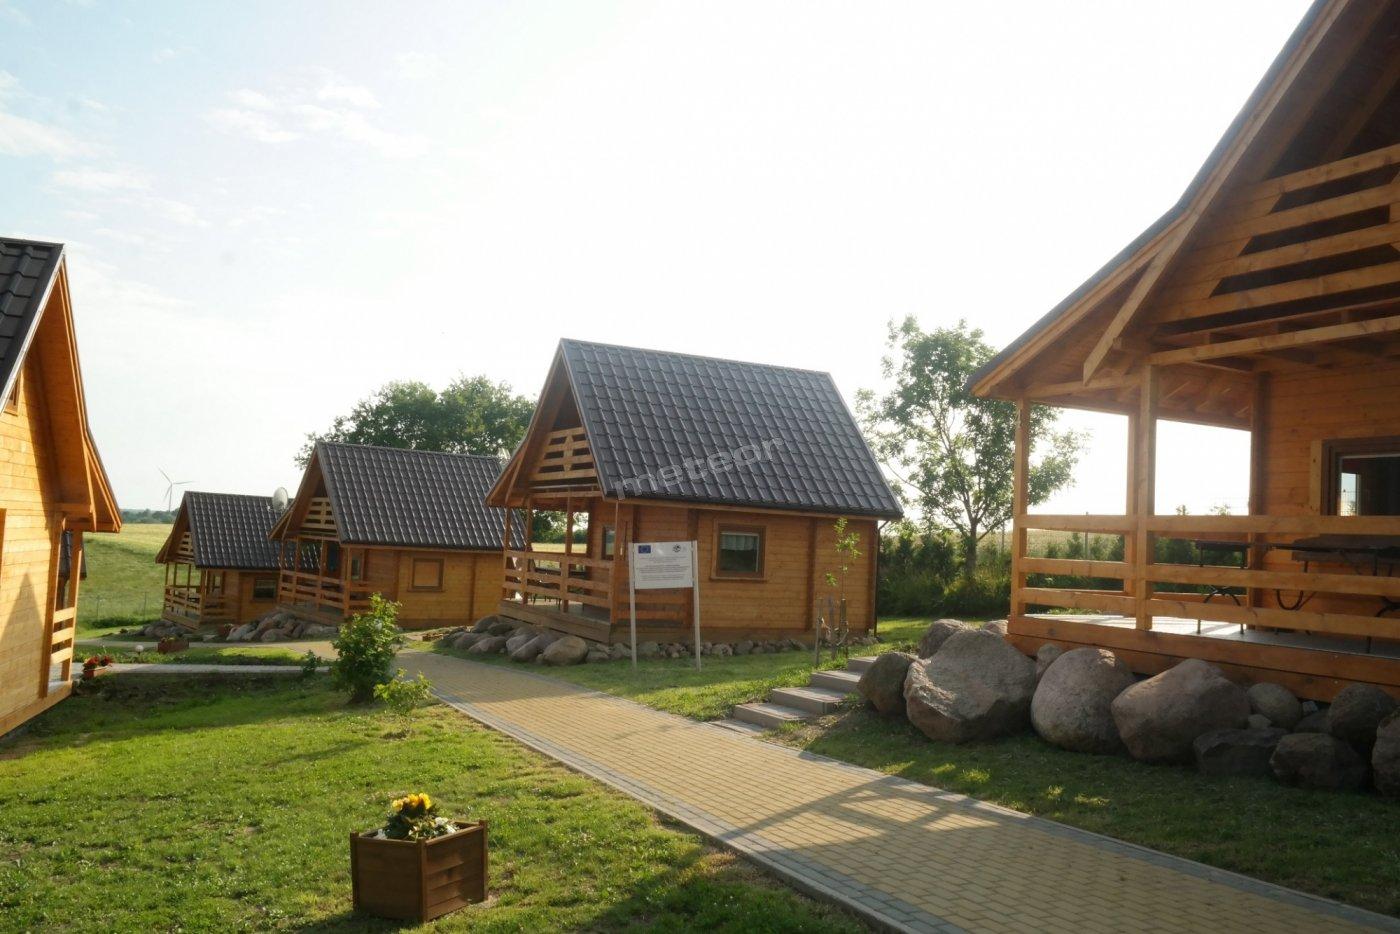 Domki Letniskowe Sielanka u Franka